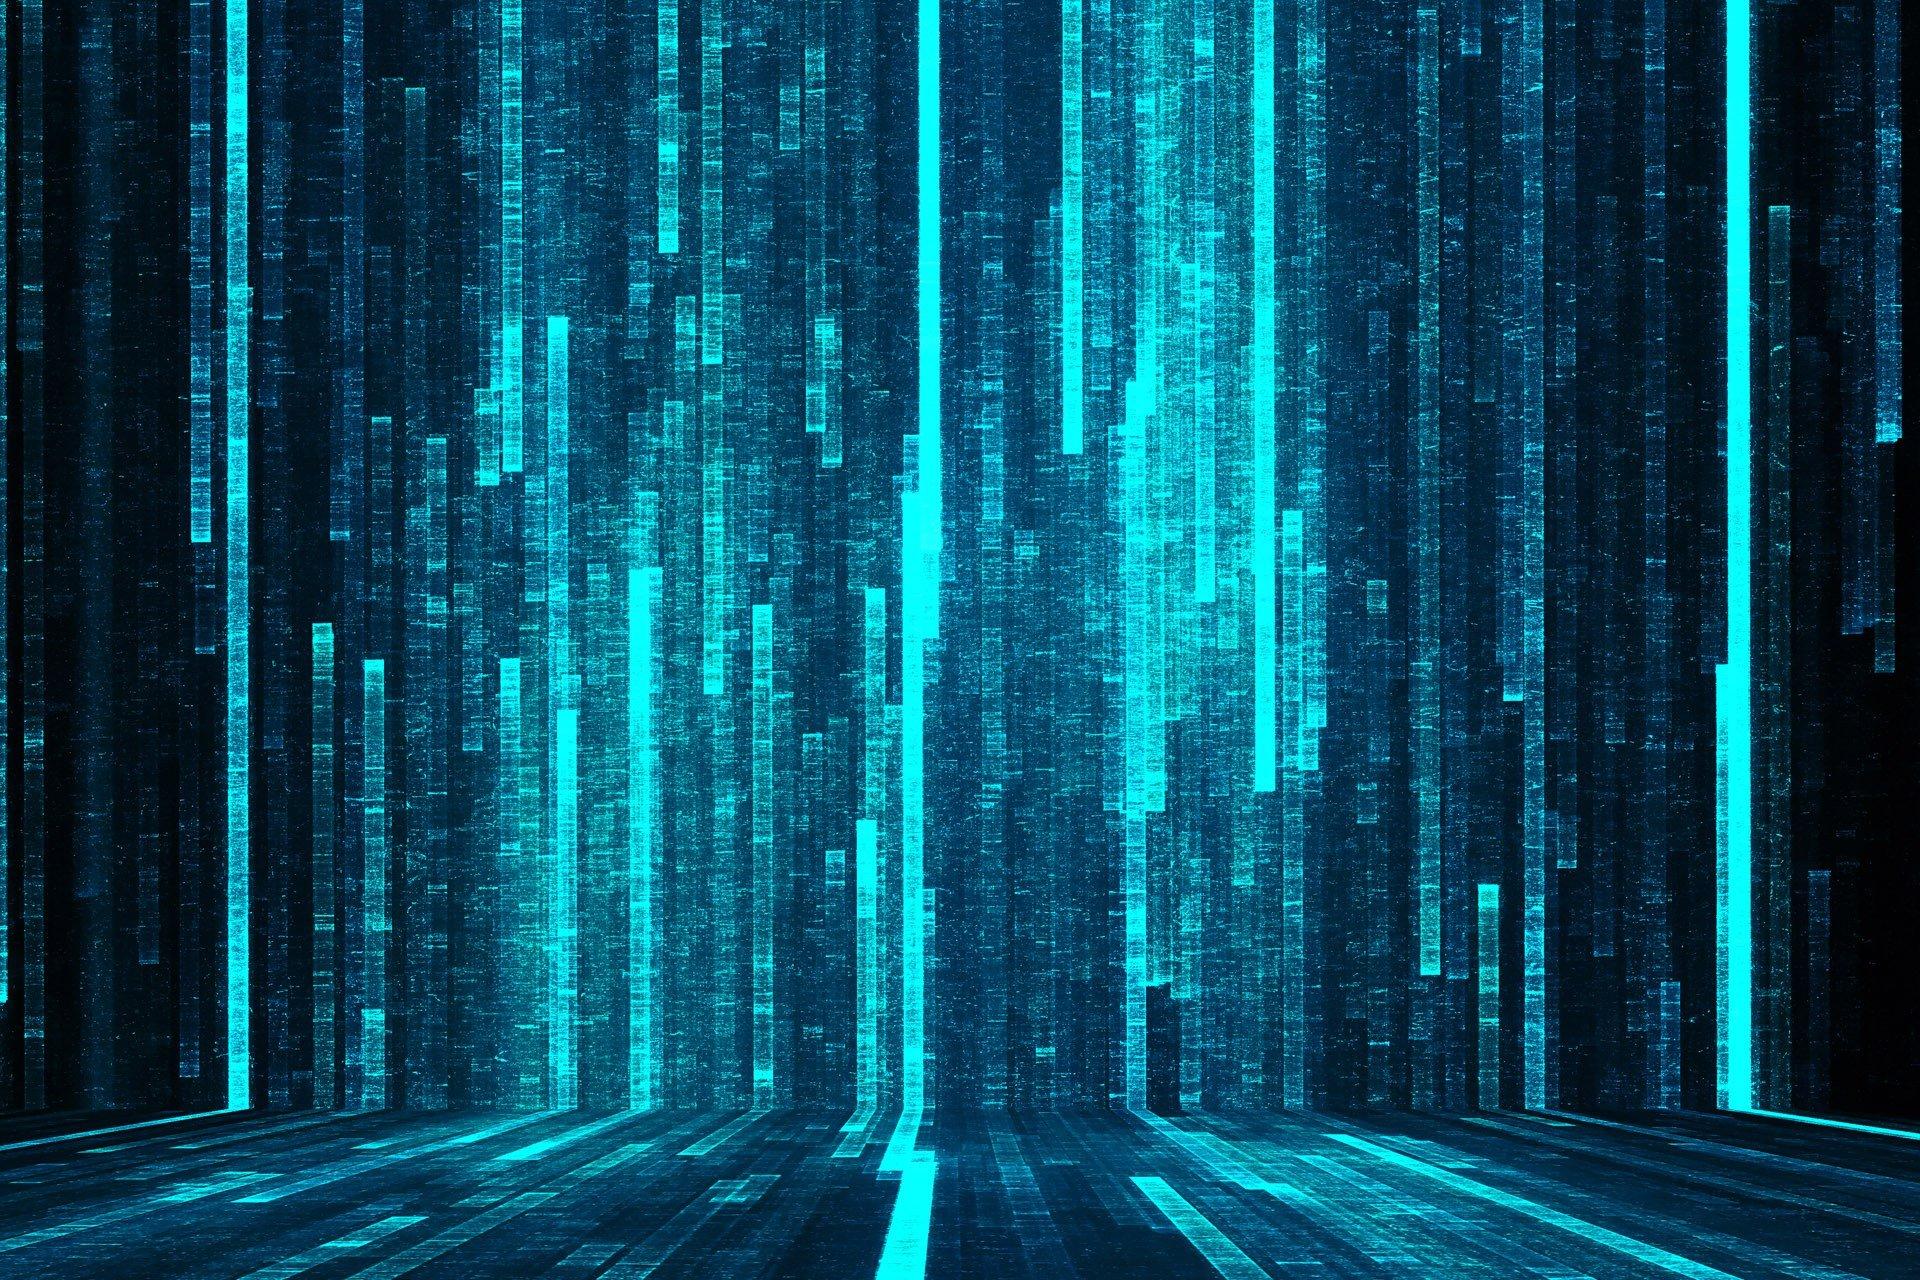 3d Cube Live Wallpaper App Download Hacker Hacking Hack Anarchy Virus Internet Computer Sadic